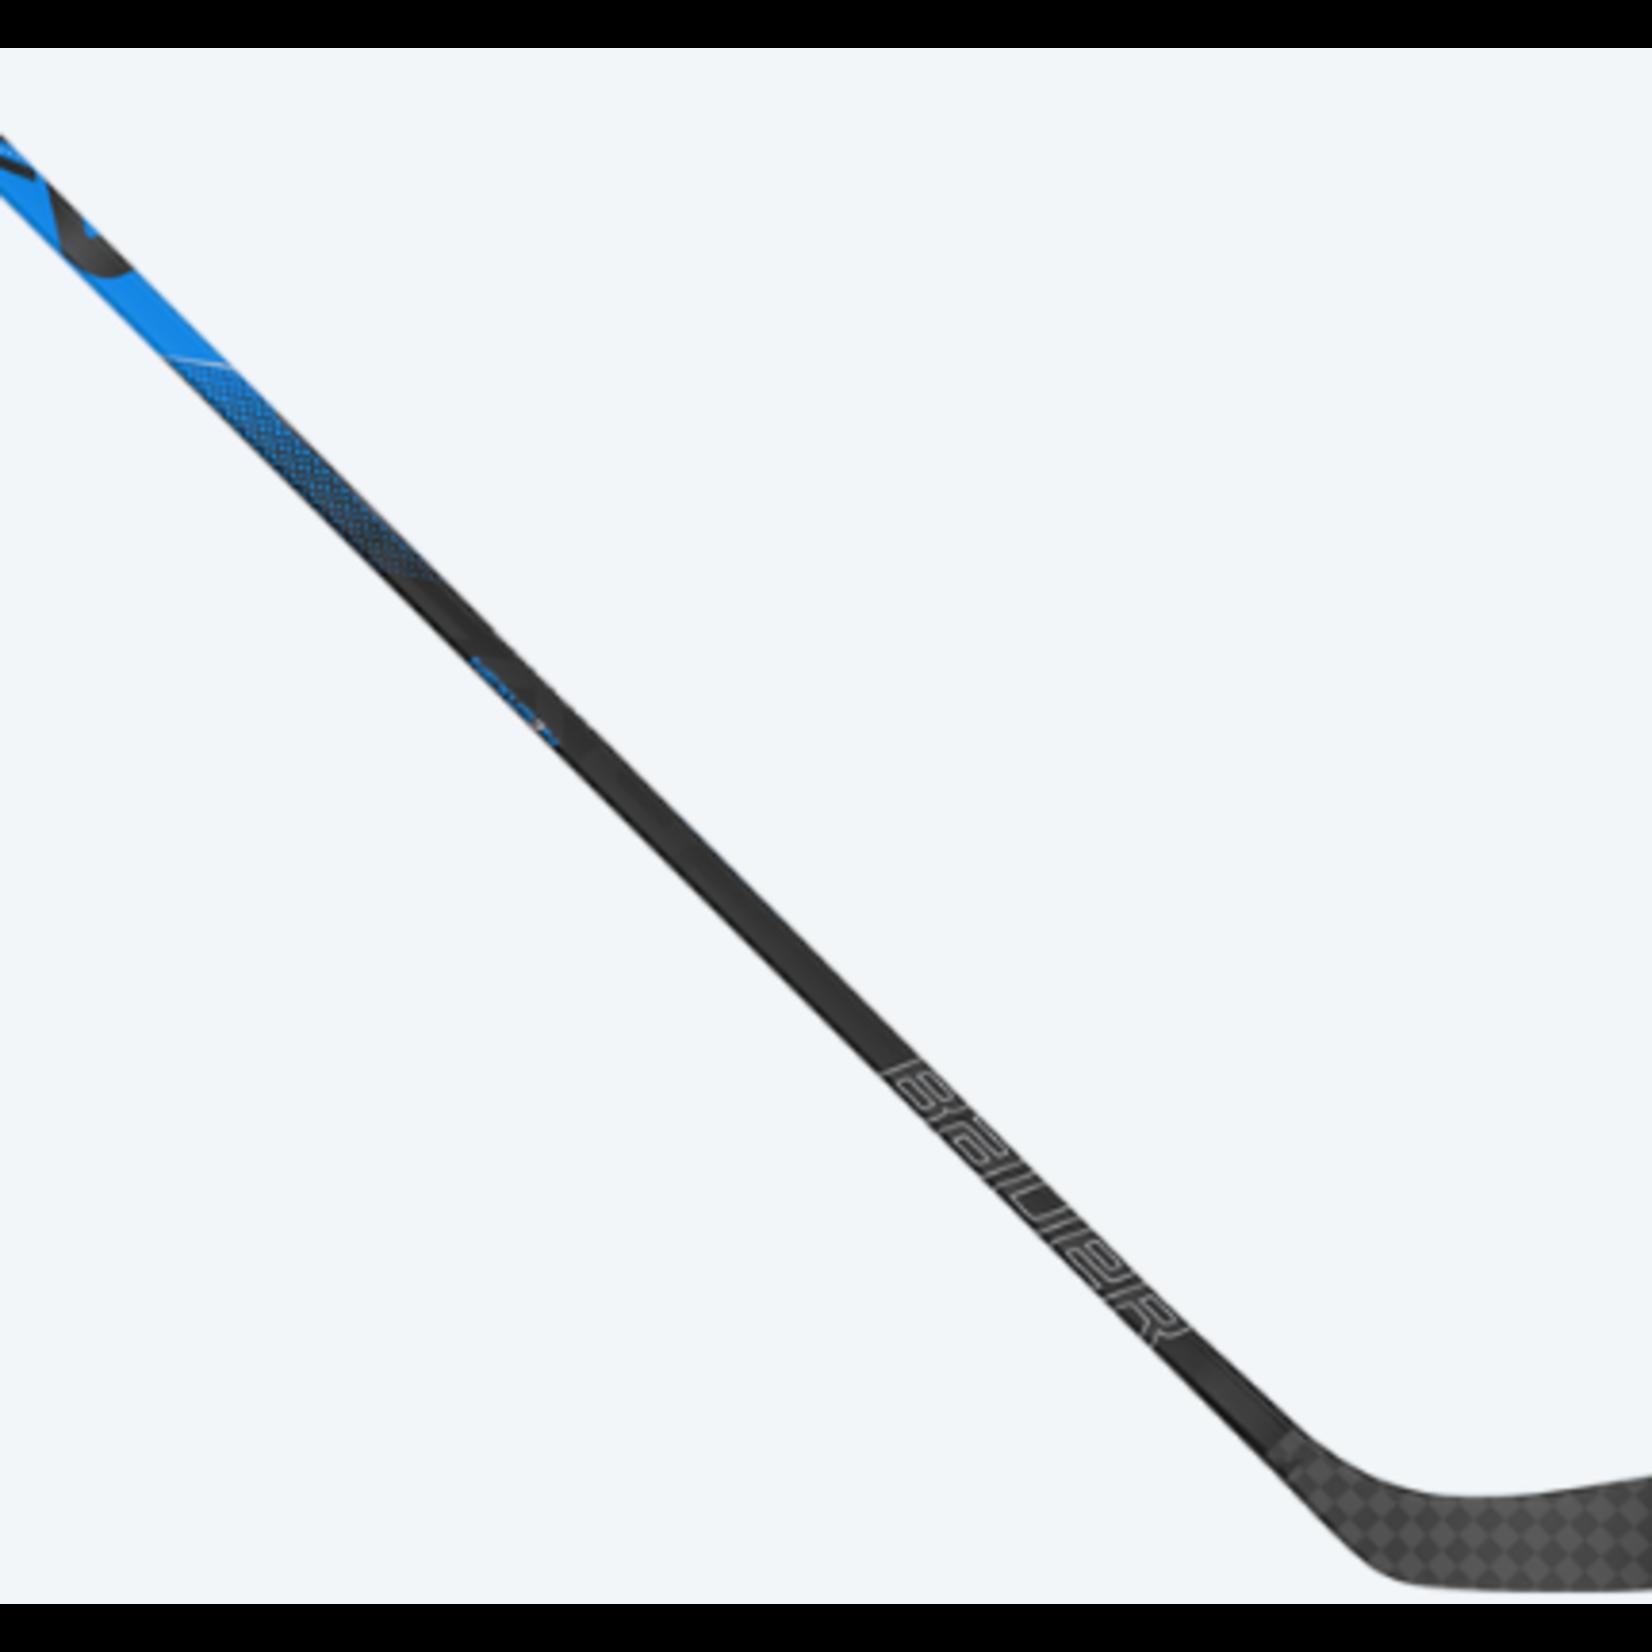 S21 Nexus 3N Grip Stick Sr - 87